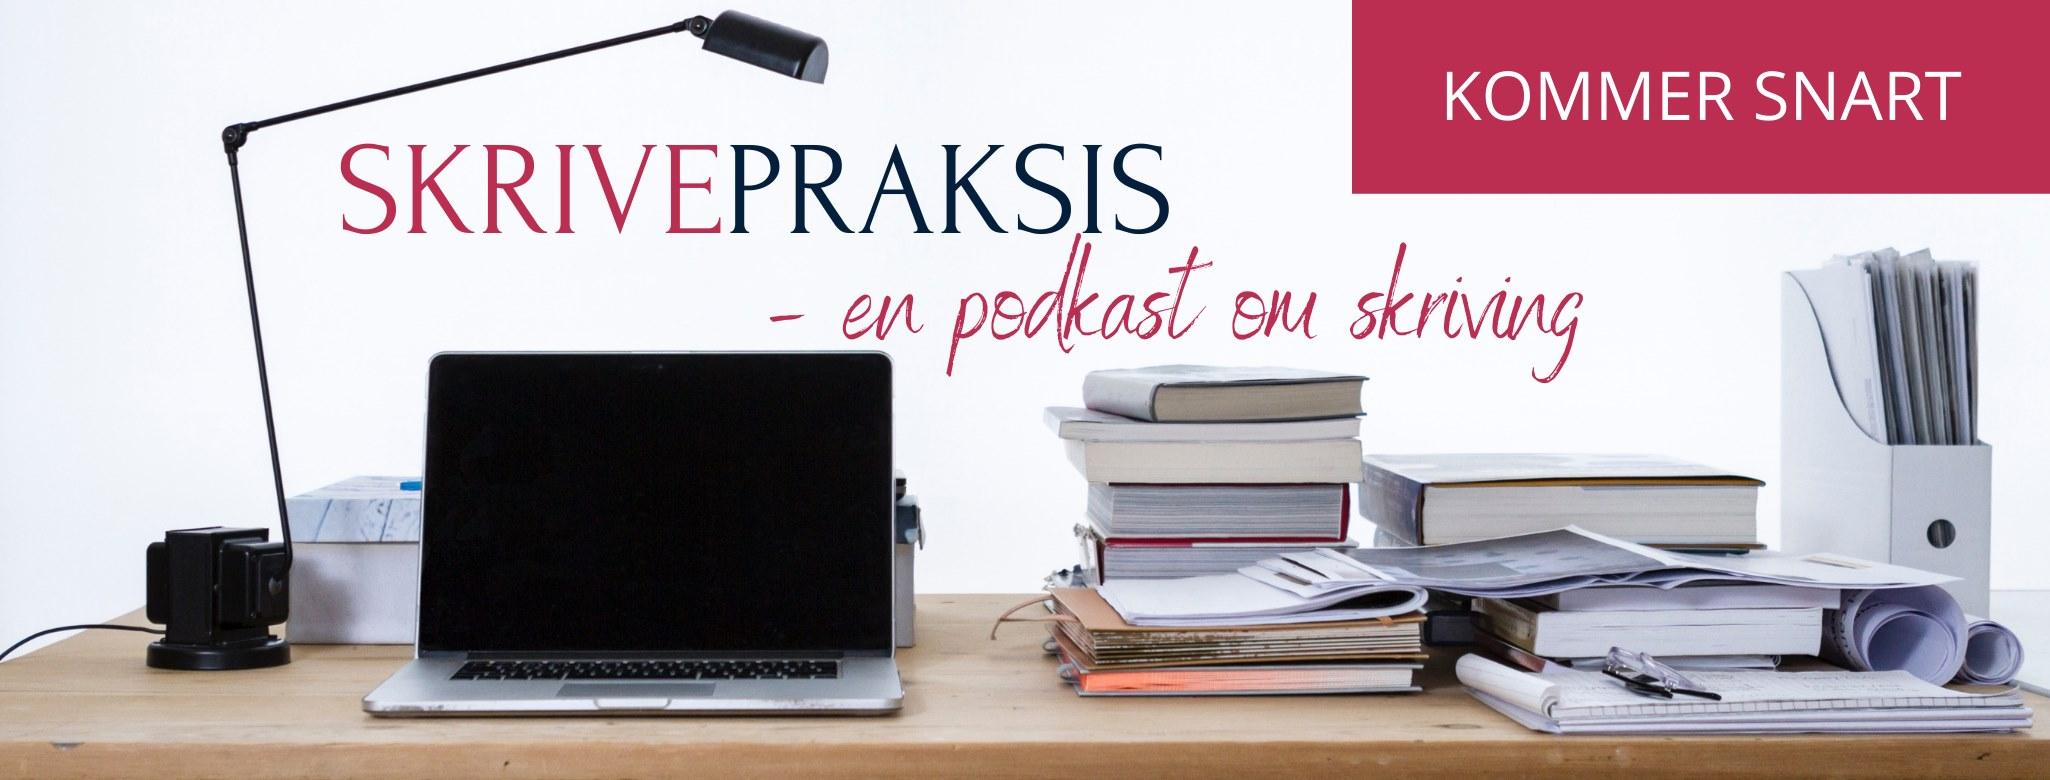 skrivepraksis-podcast-kommer-cingulum